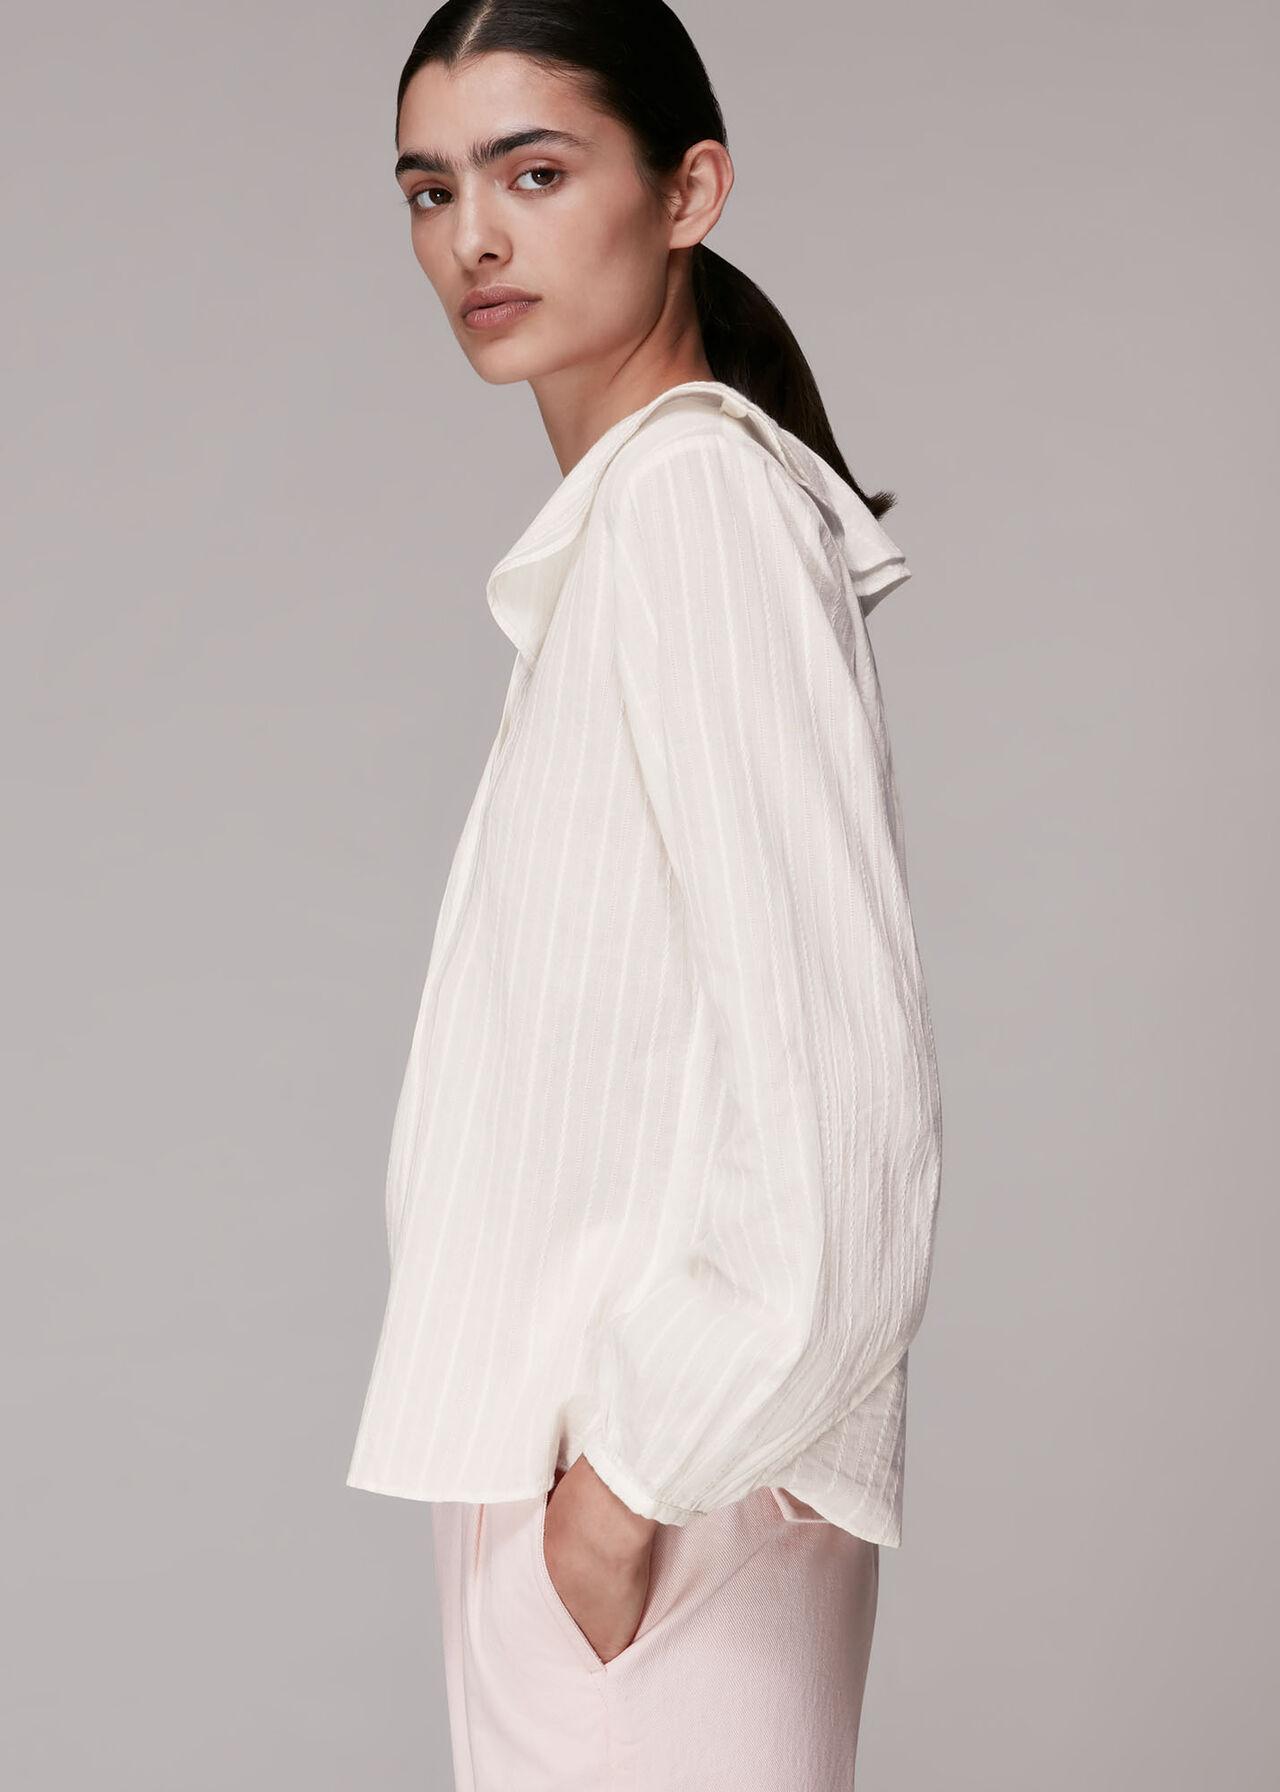 Darcie Cotton Collar Top